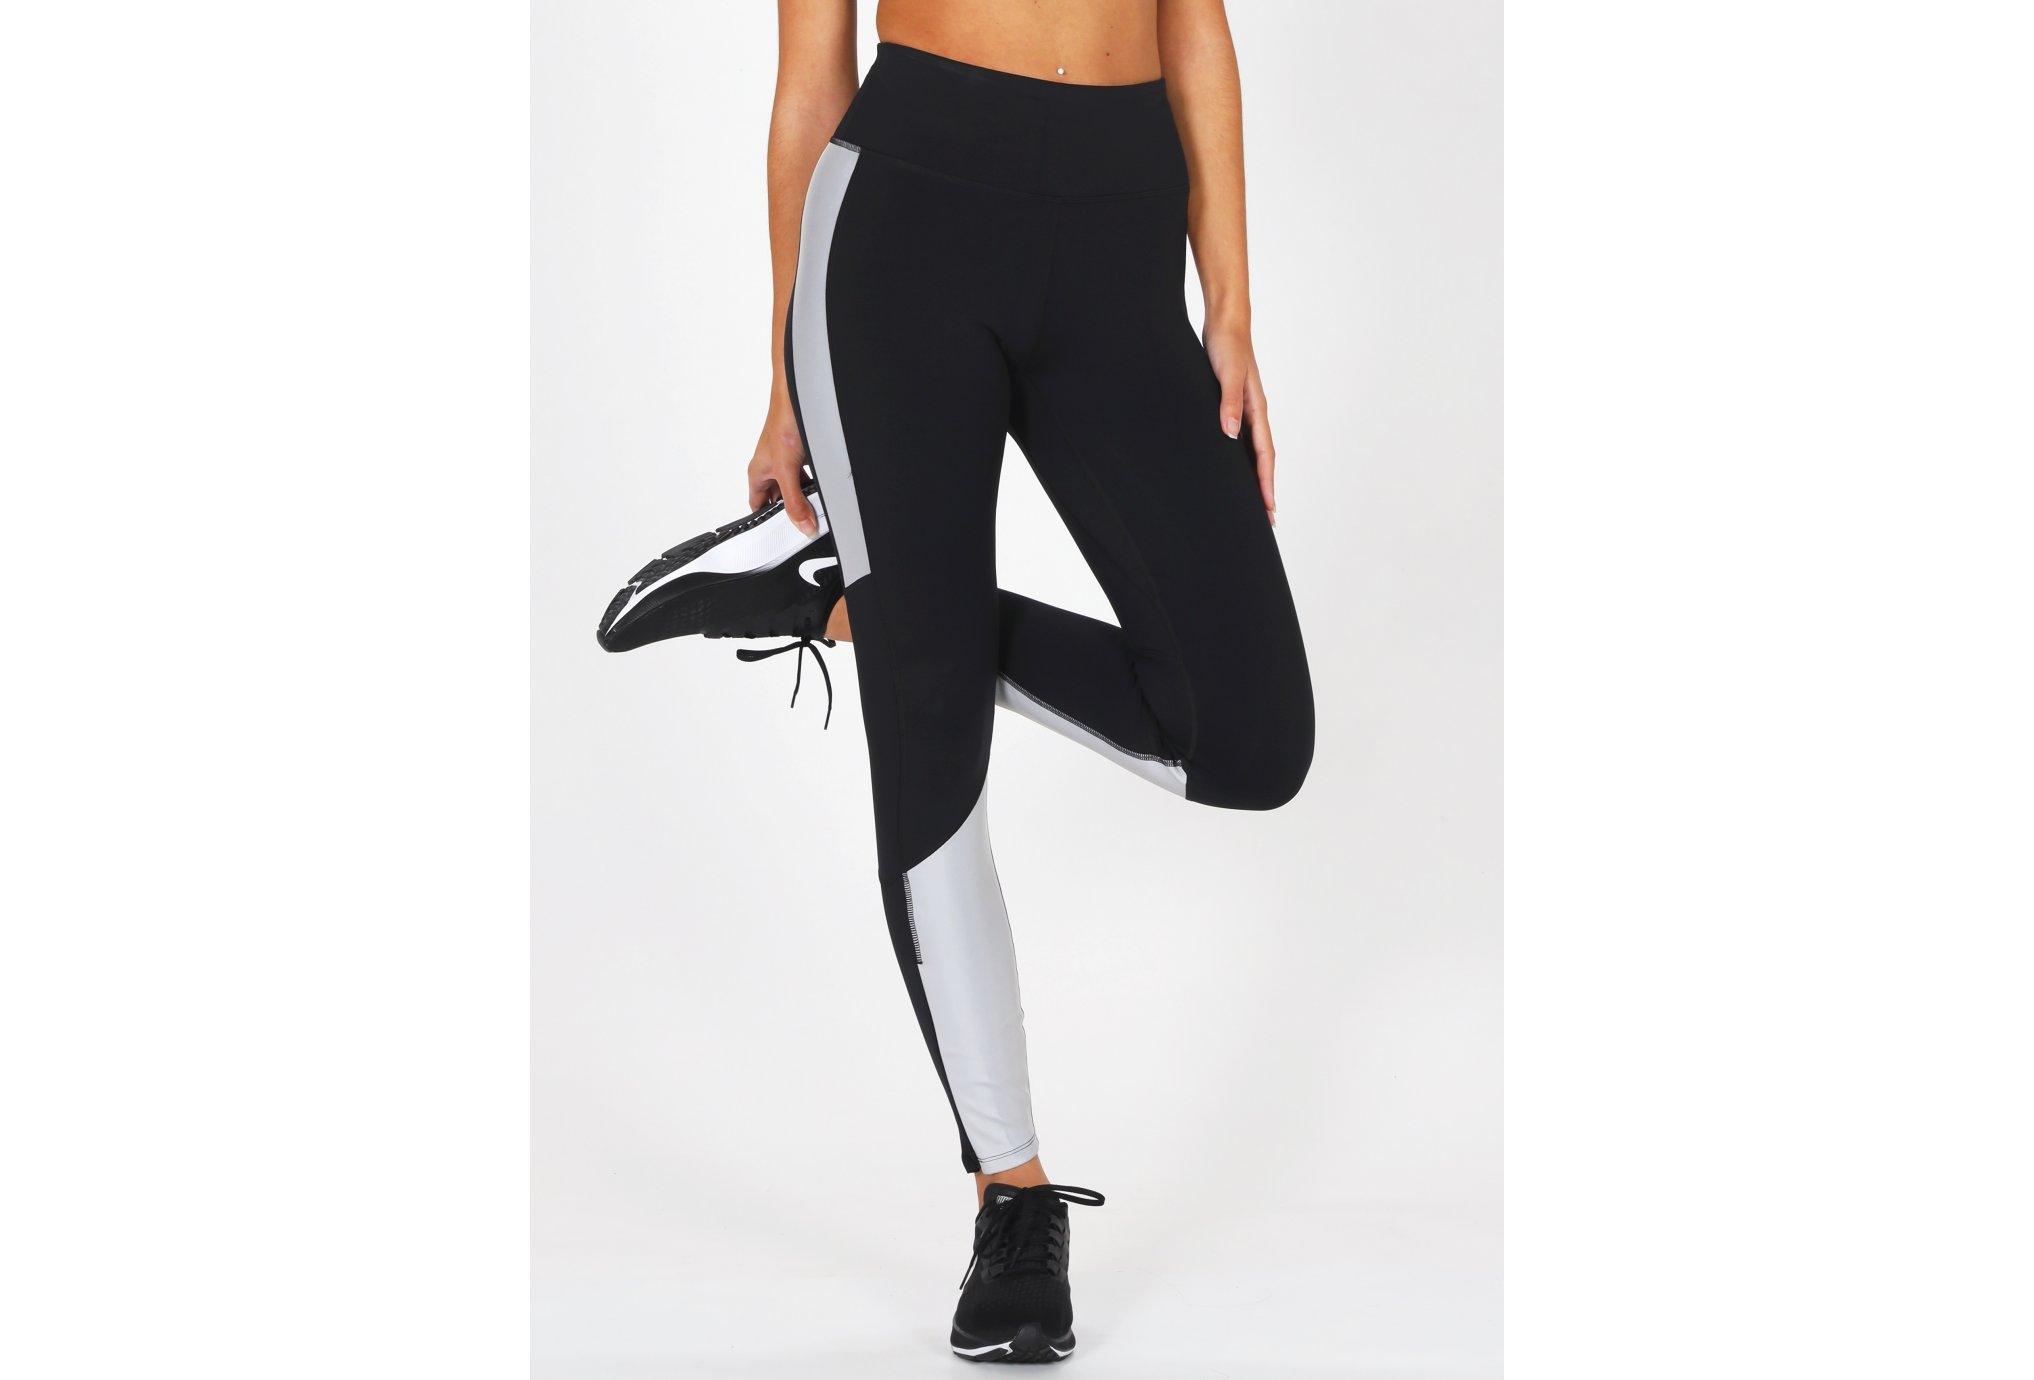 Nike Epic Lux Run Division Flash W vêtement running femme